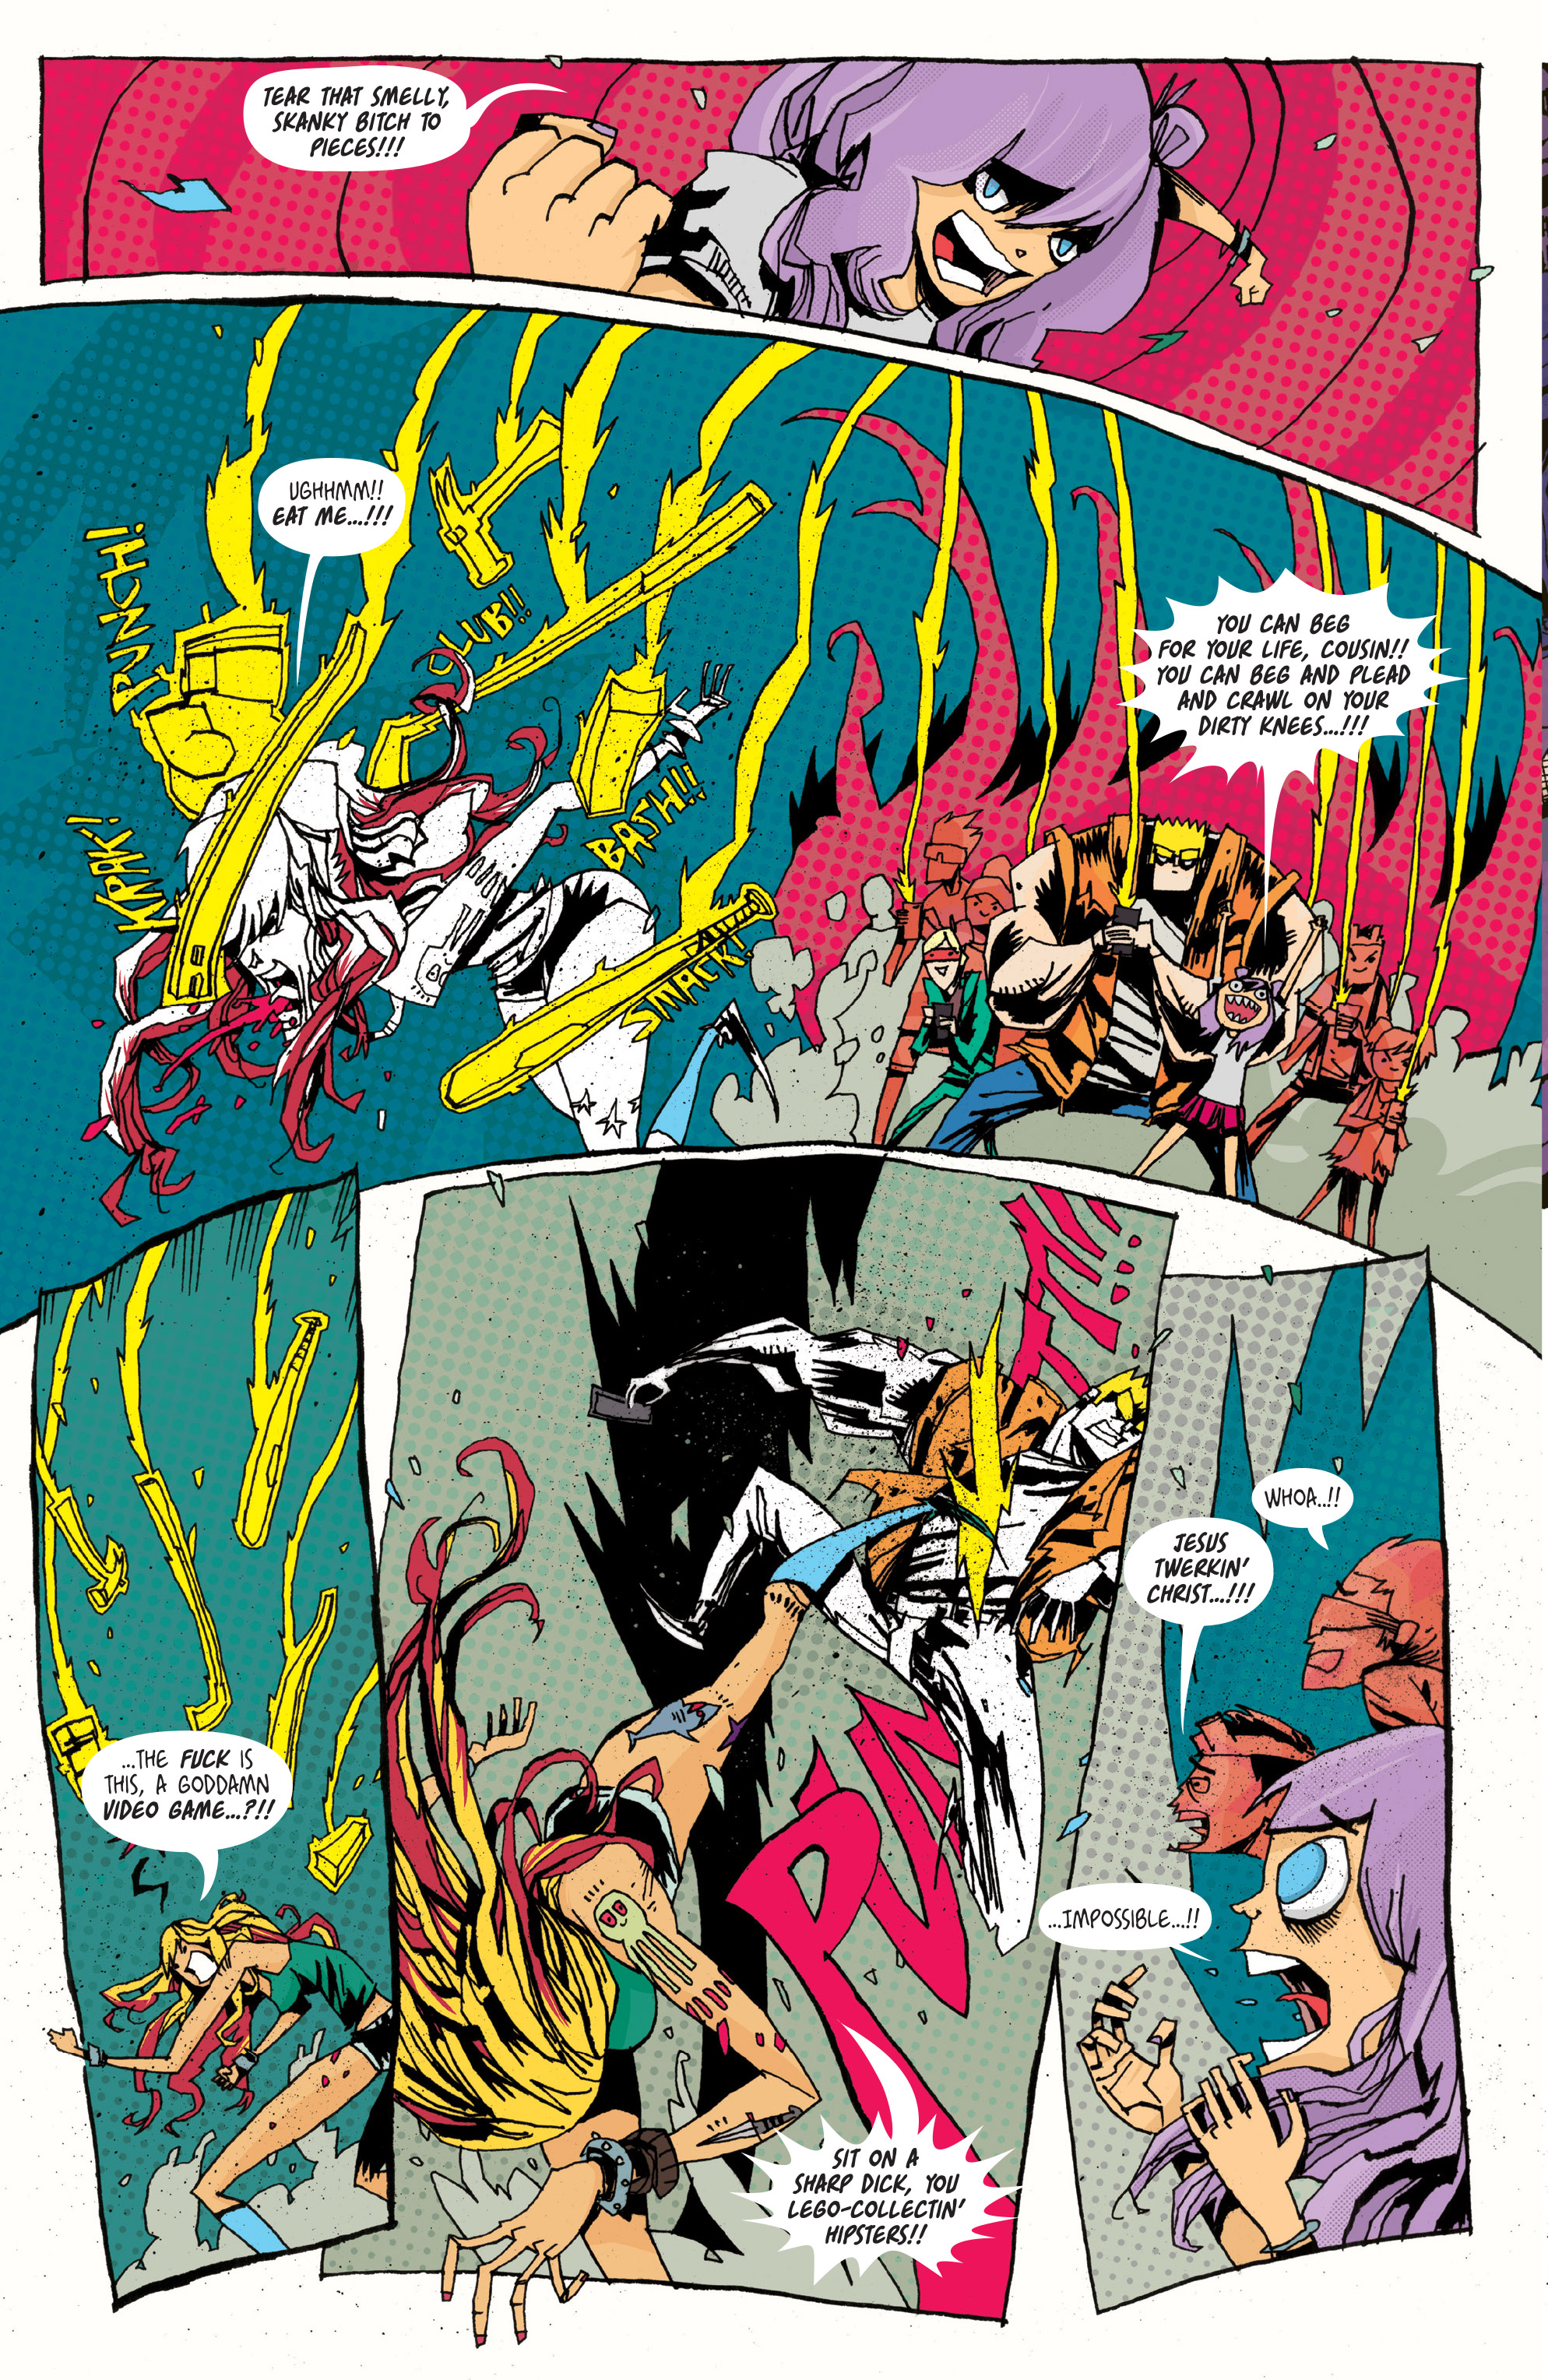 Read online Grrl Scouts: Magic Socks comic -  Issue #2 - 18